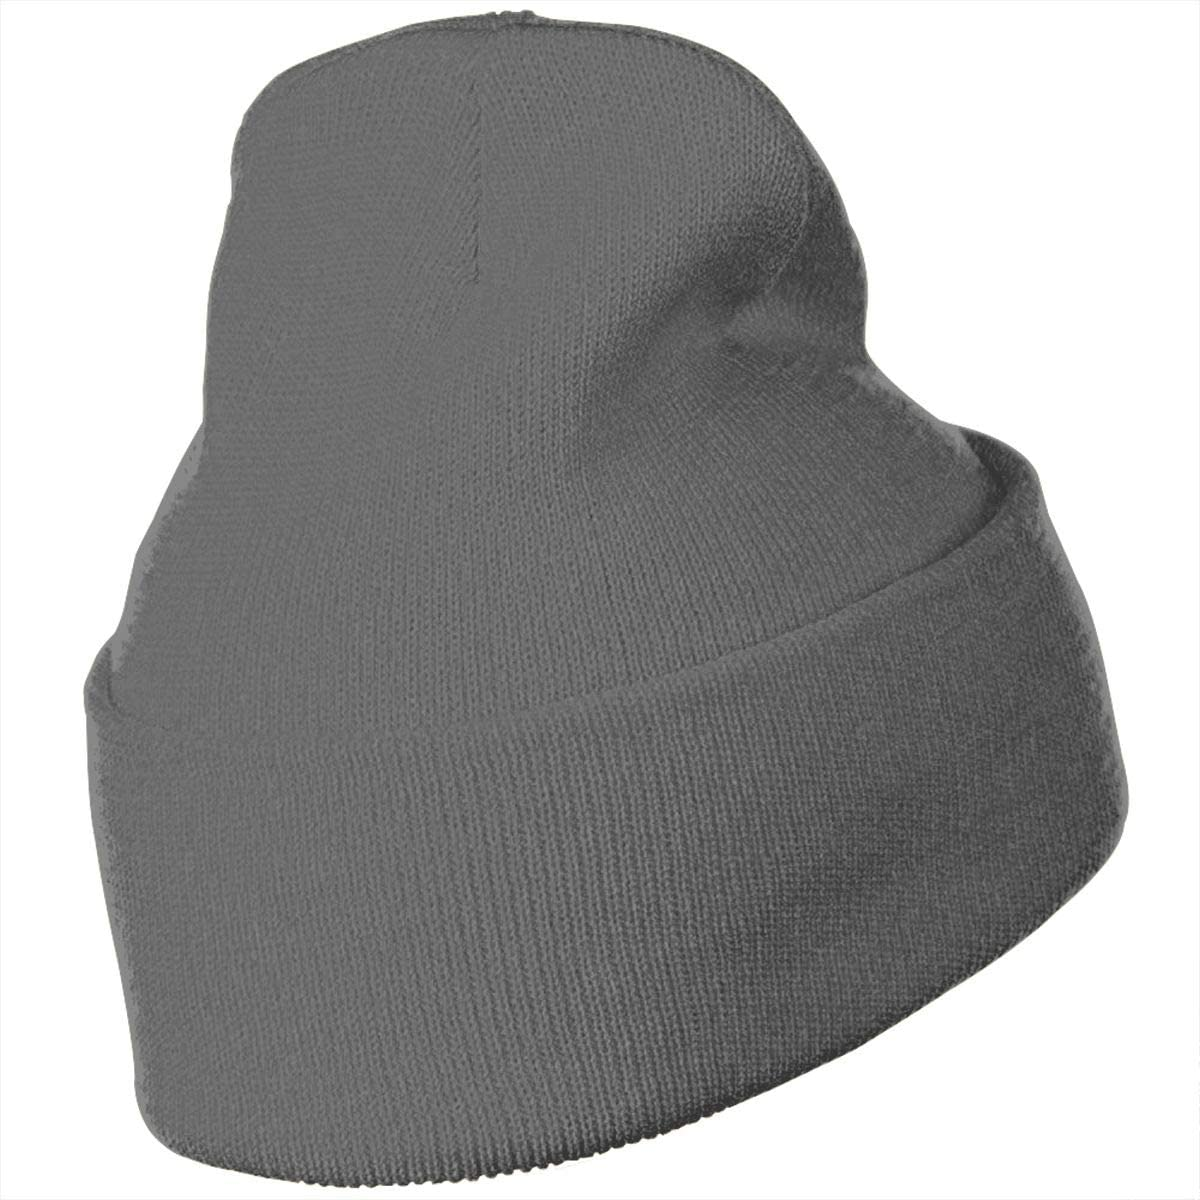 Z-YY Mathematics Shape Unisex Winter Knitting Woolen Hat Warm Cap